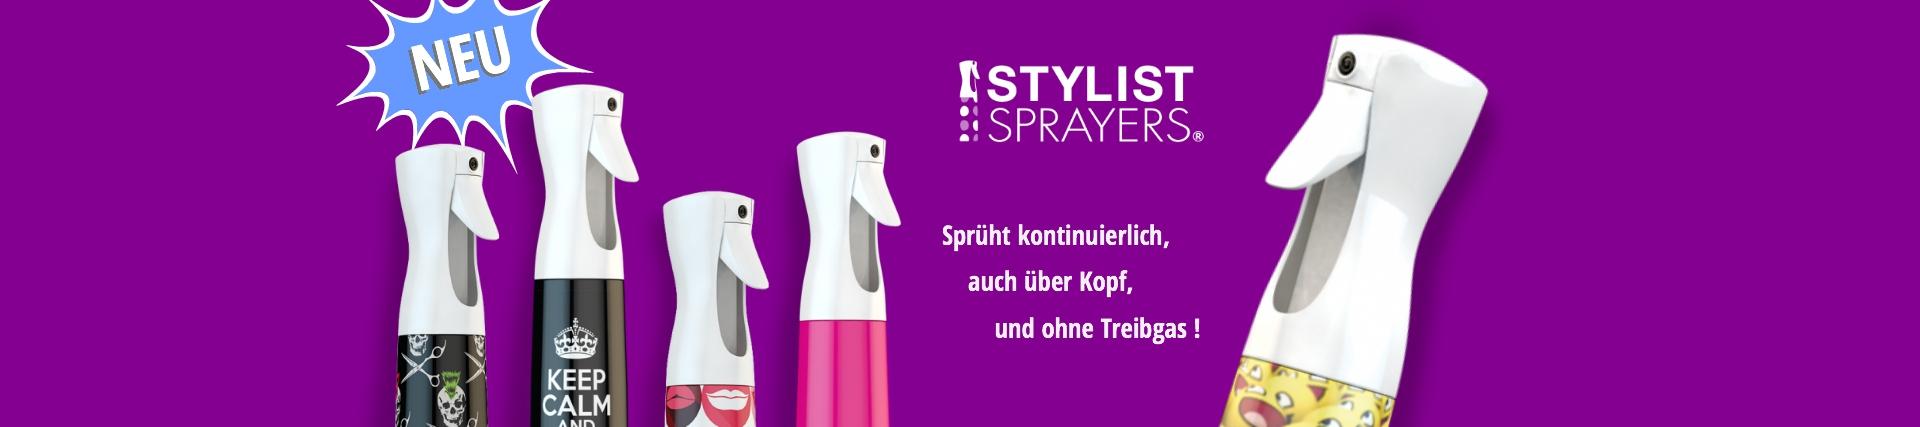 Stylist Sprayers - NEU aus den USA !!